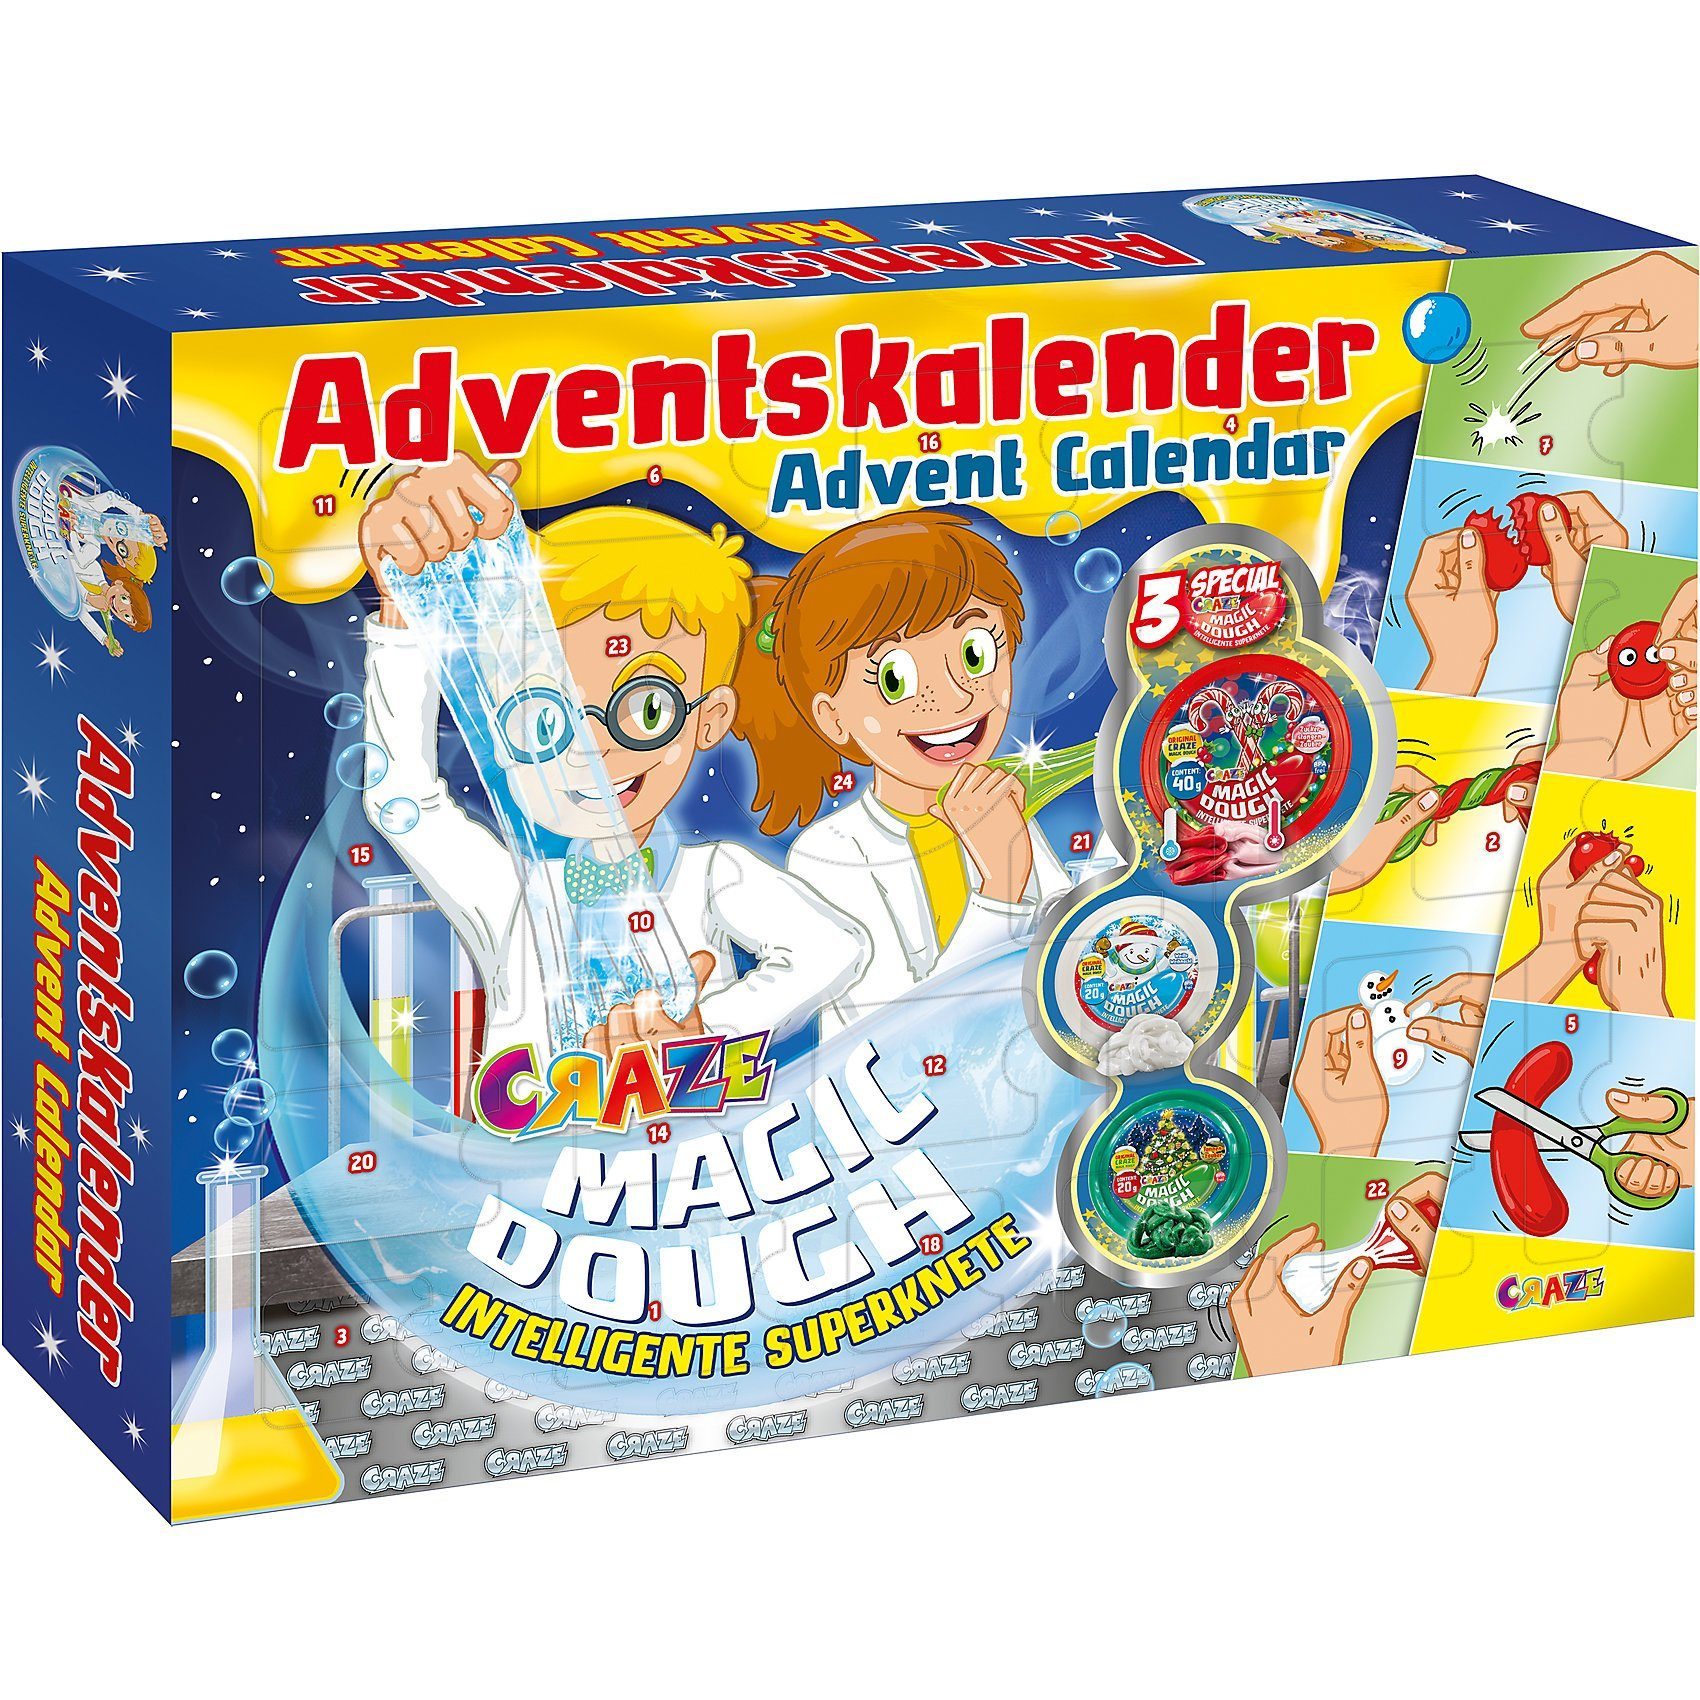 CRAZE Adventskalender Magic Dough